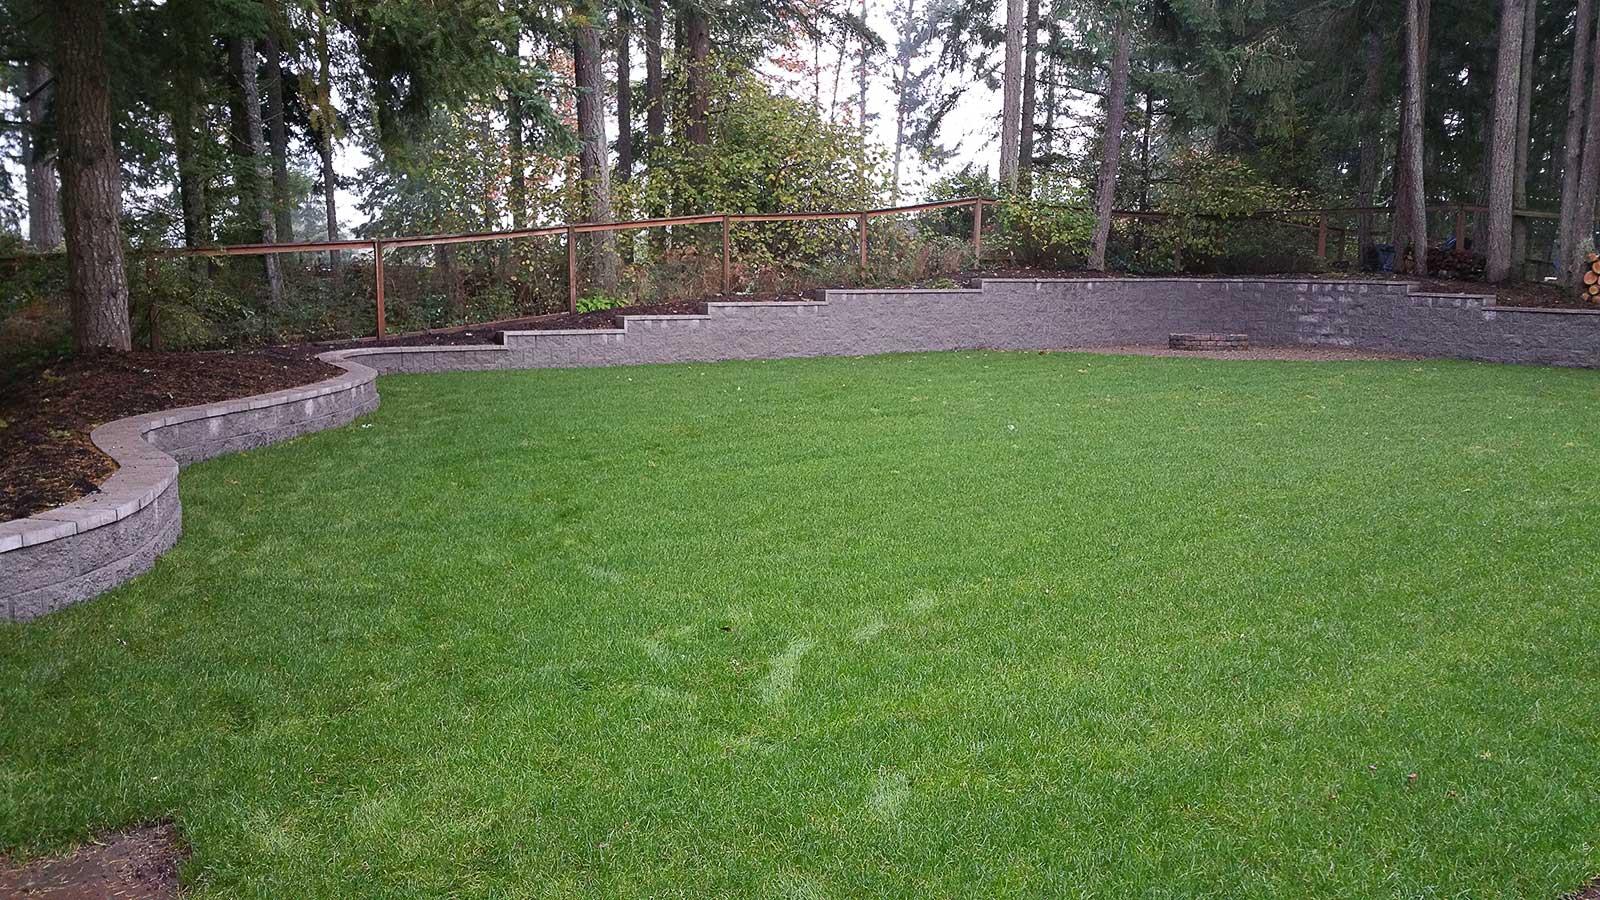 Back Yard Excavation : Complete backyard landscaping overhaul in east olympia